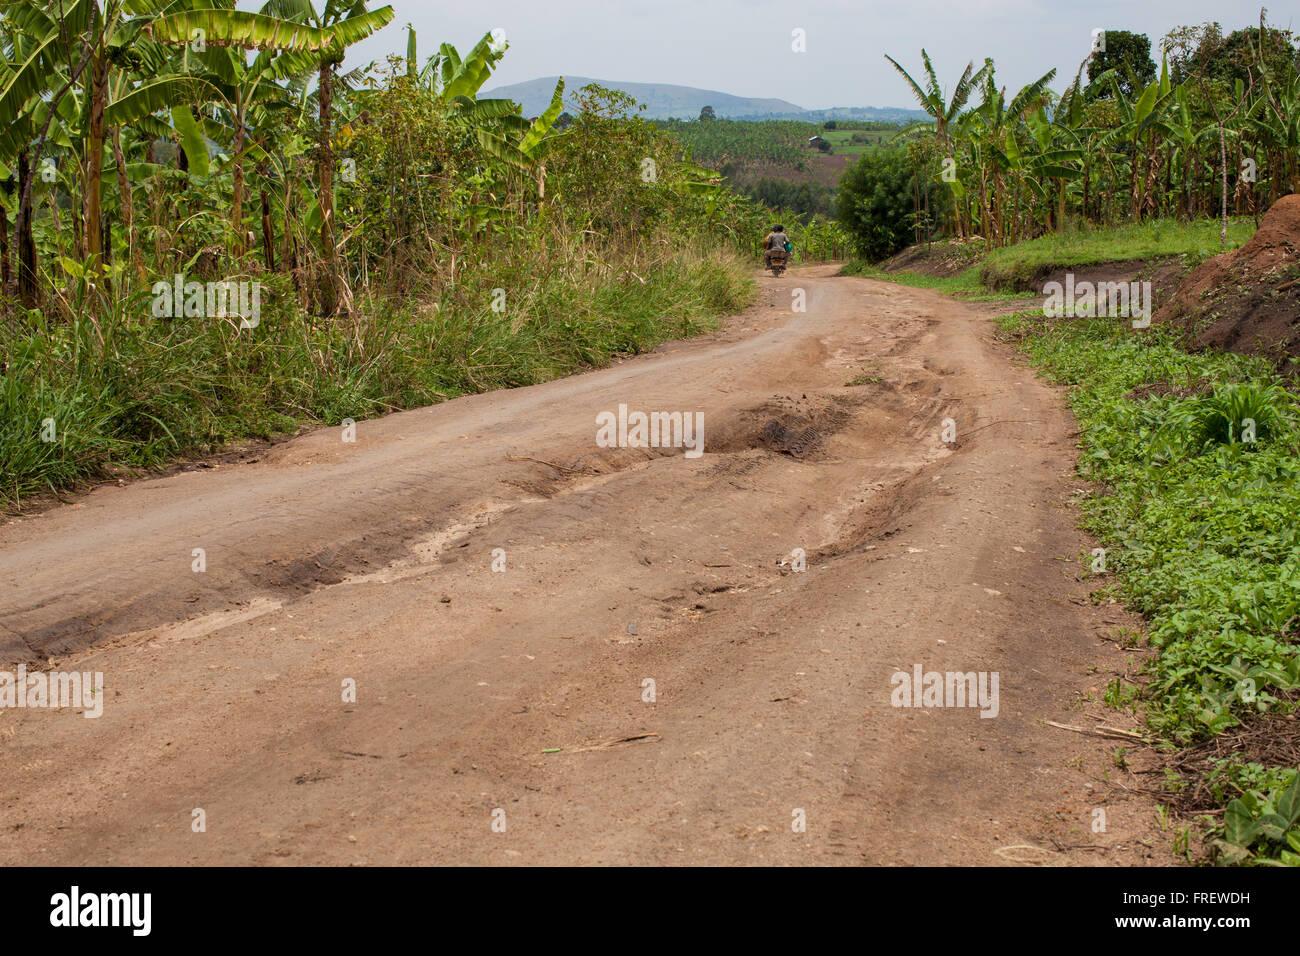 Eine holprige und staubige Straße, Uganda-Afrika Stockbild